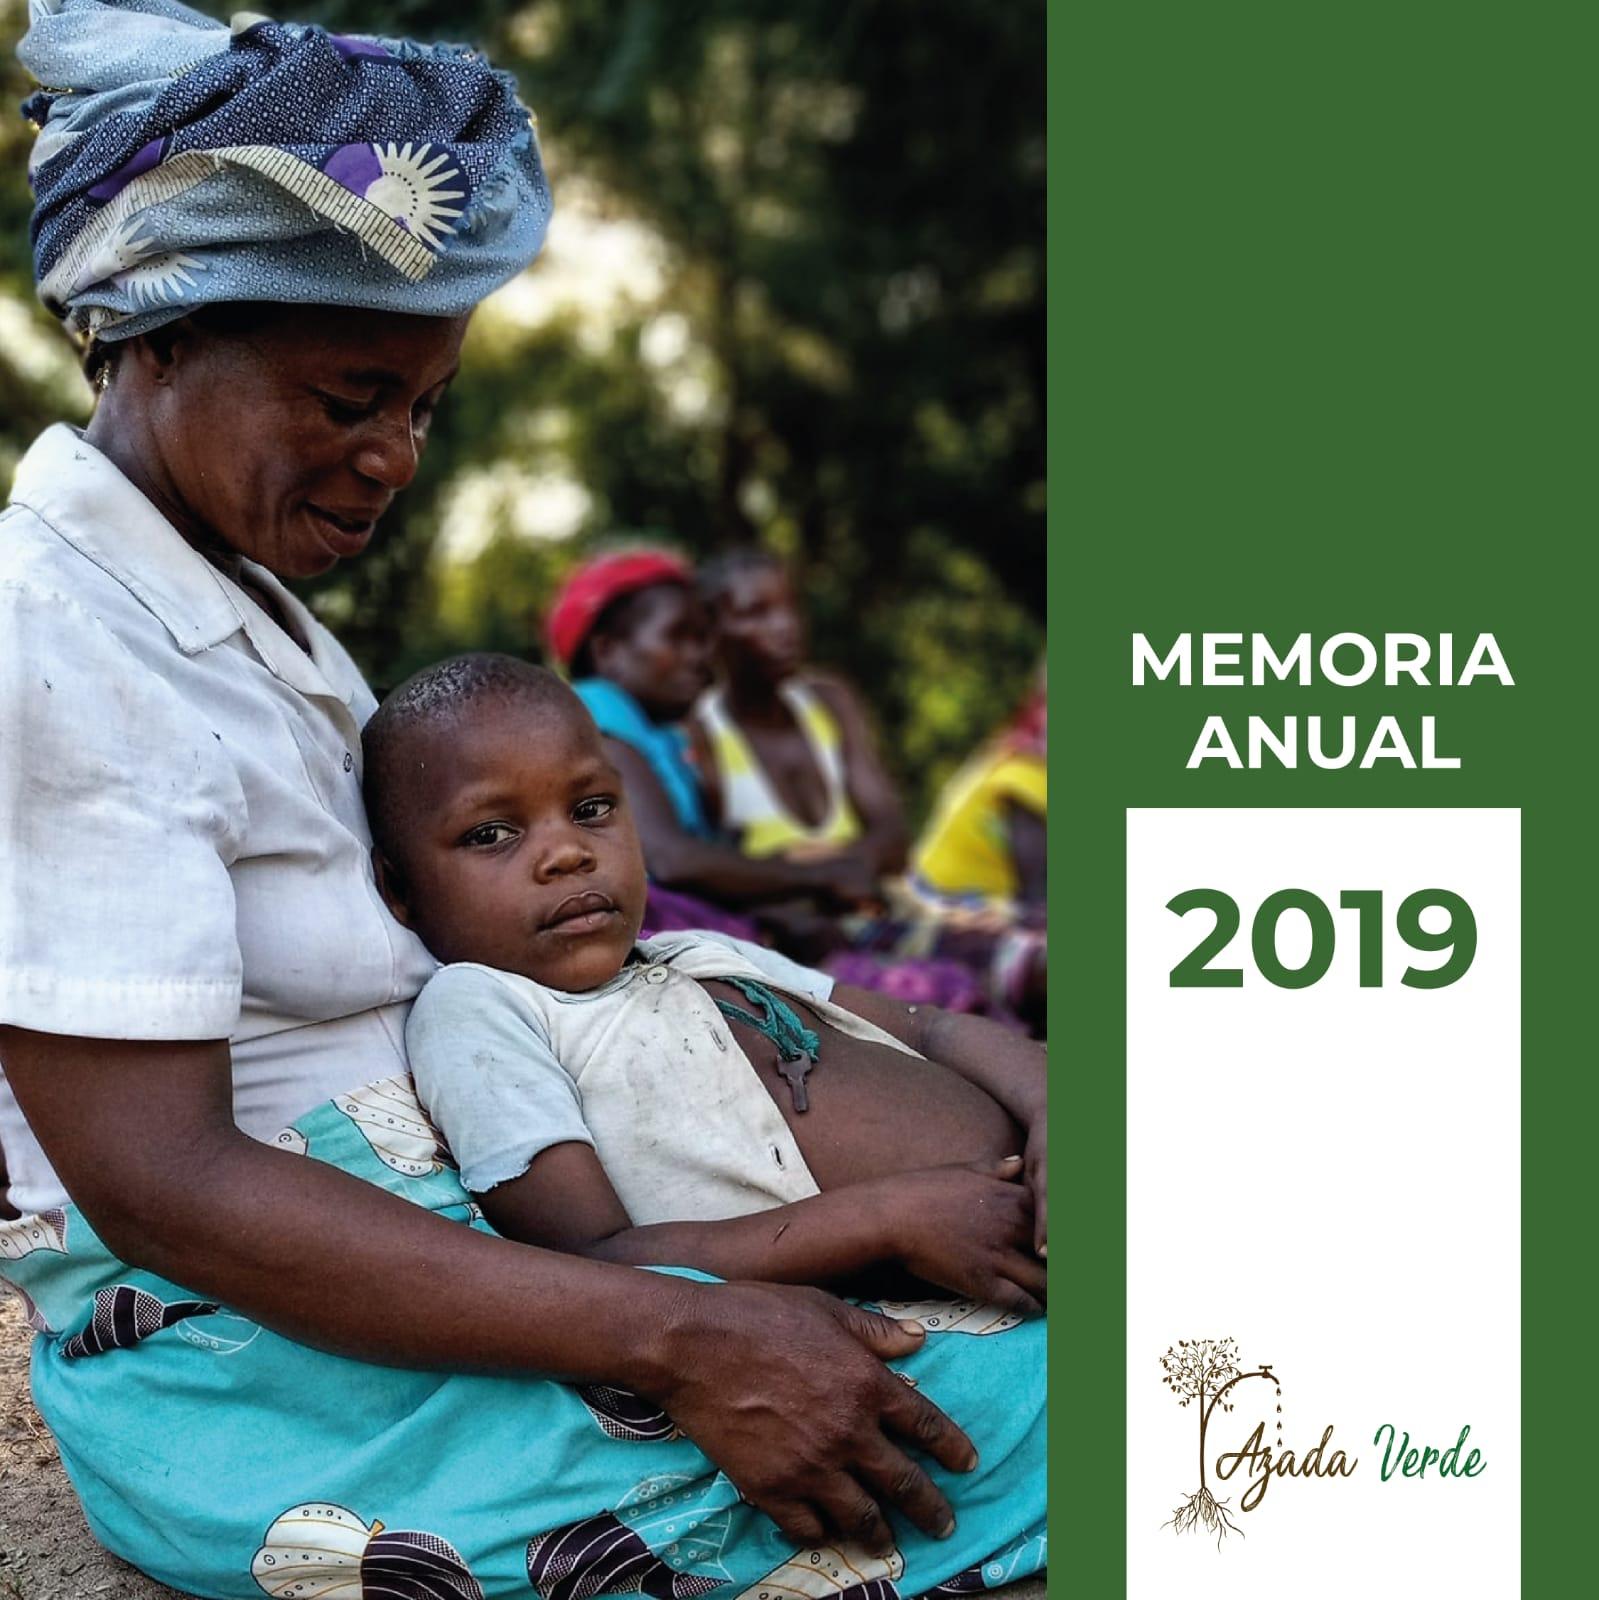 Portada Memoria Azada Verde 2019